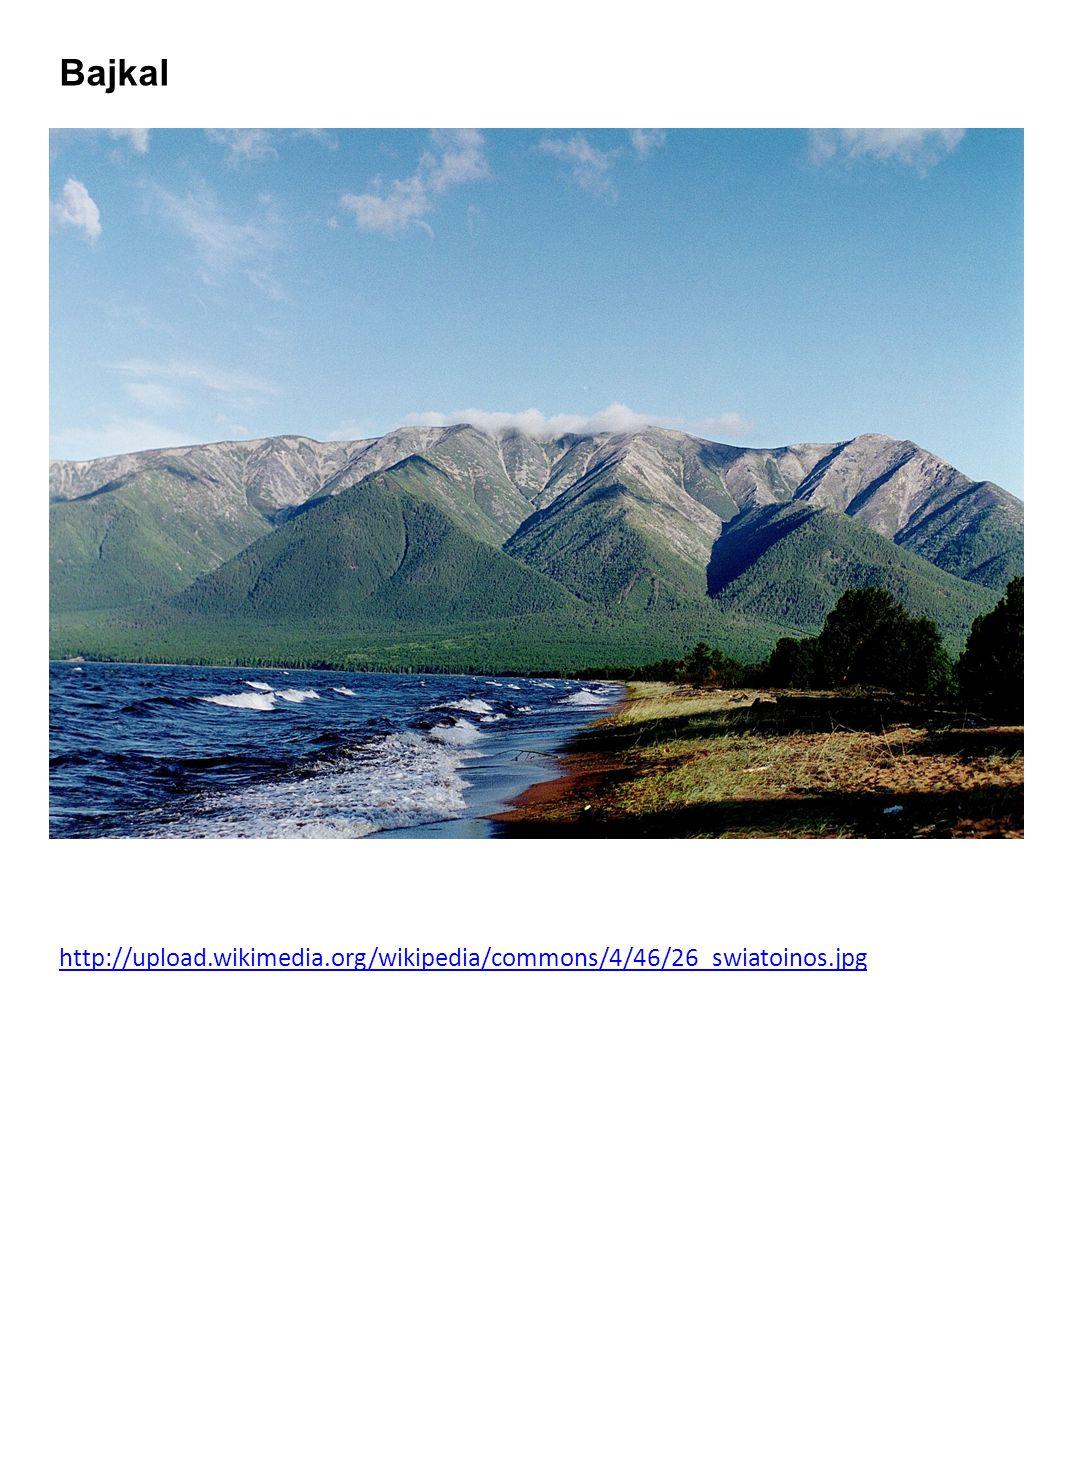 Bajkal http://upload.wikimedia.org/wikipedia/commons/4/46/26_swiatoinos.jpg